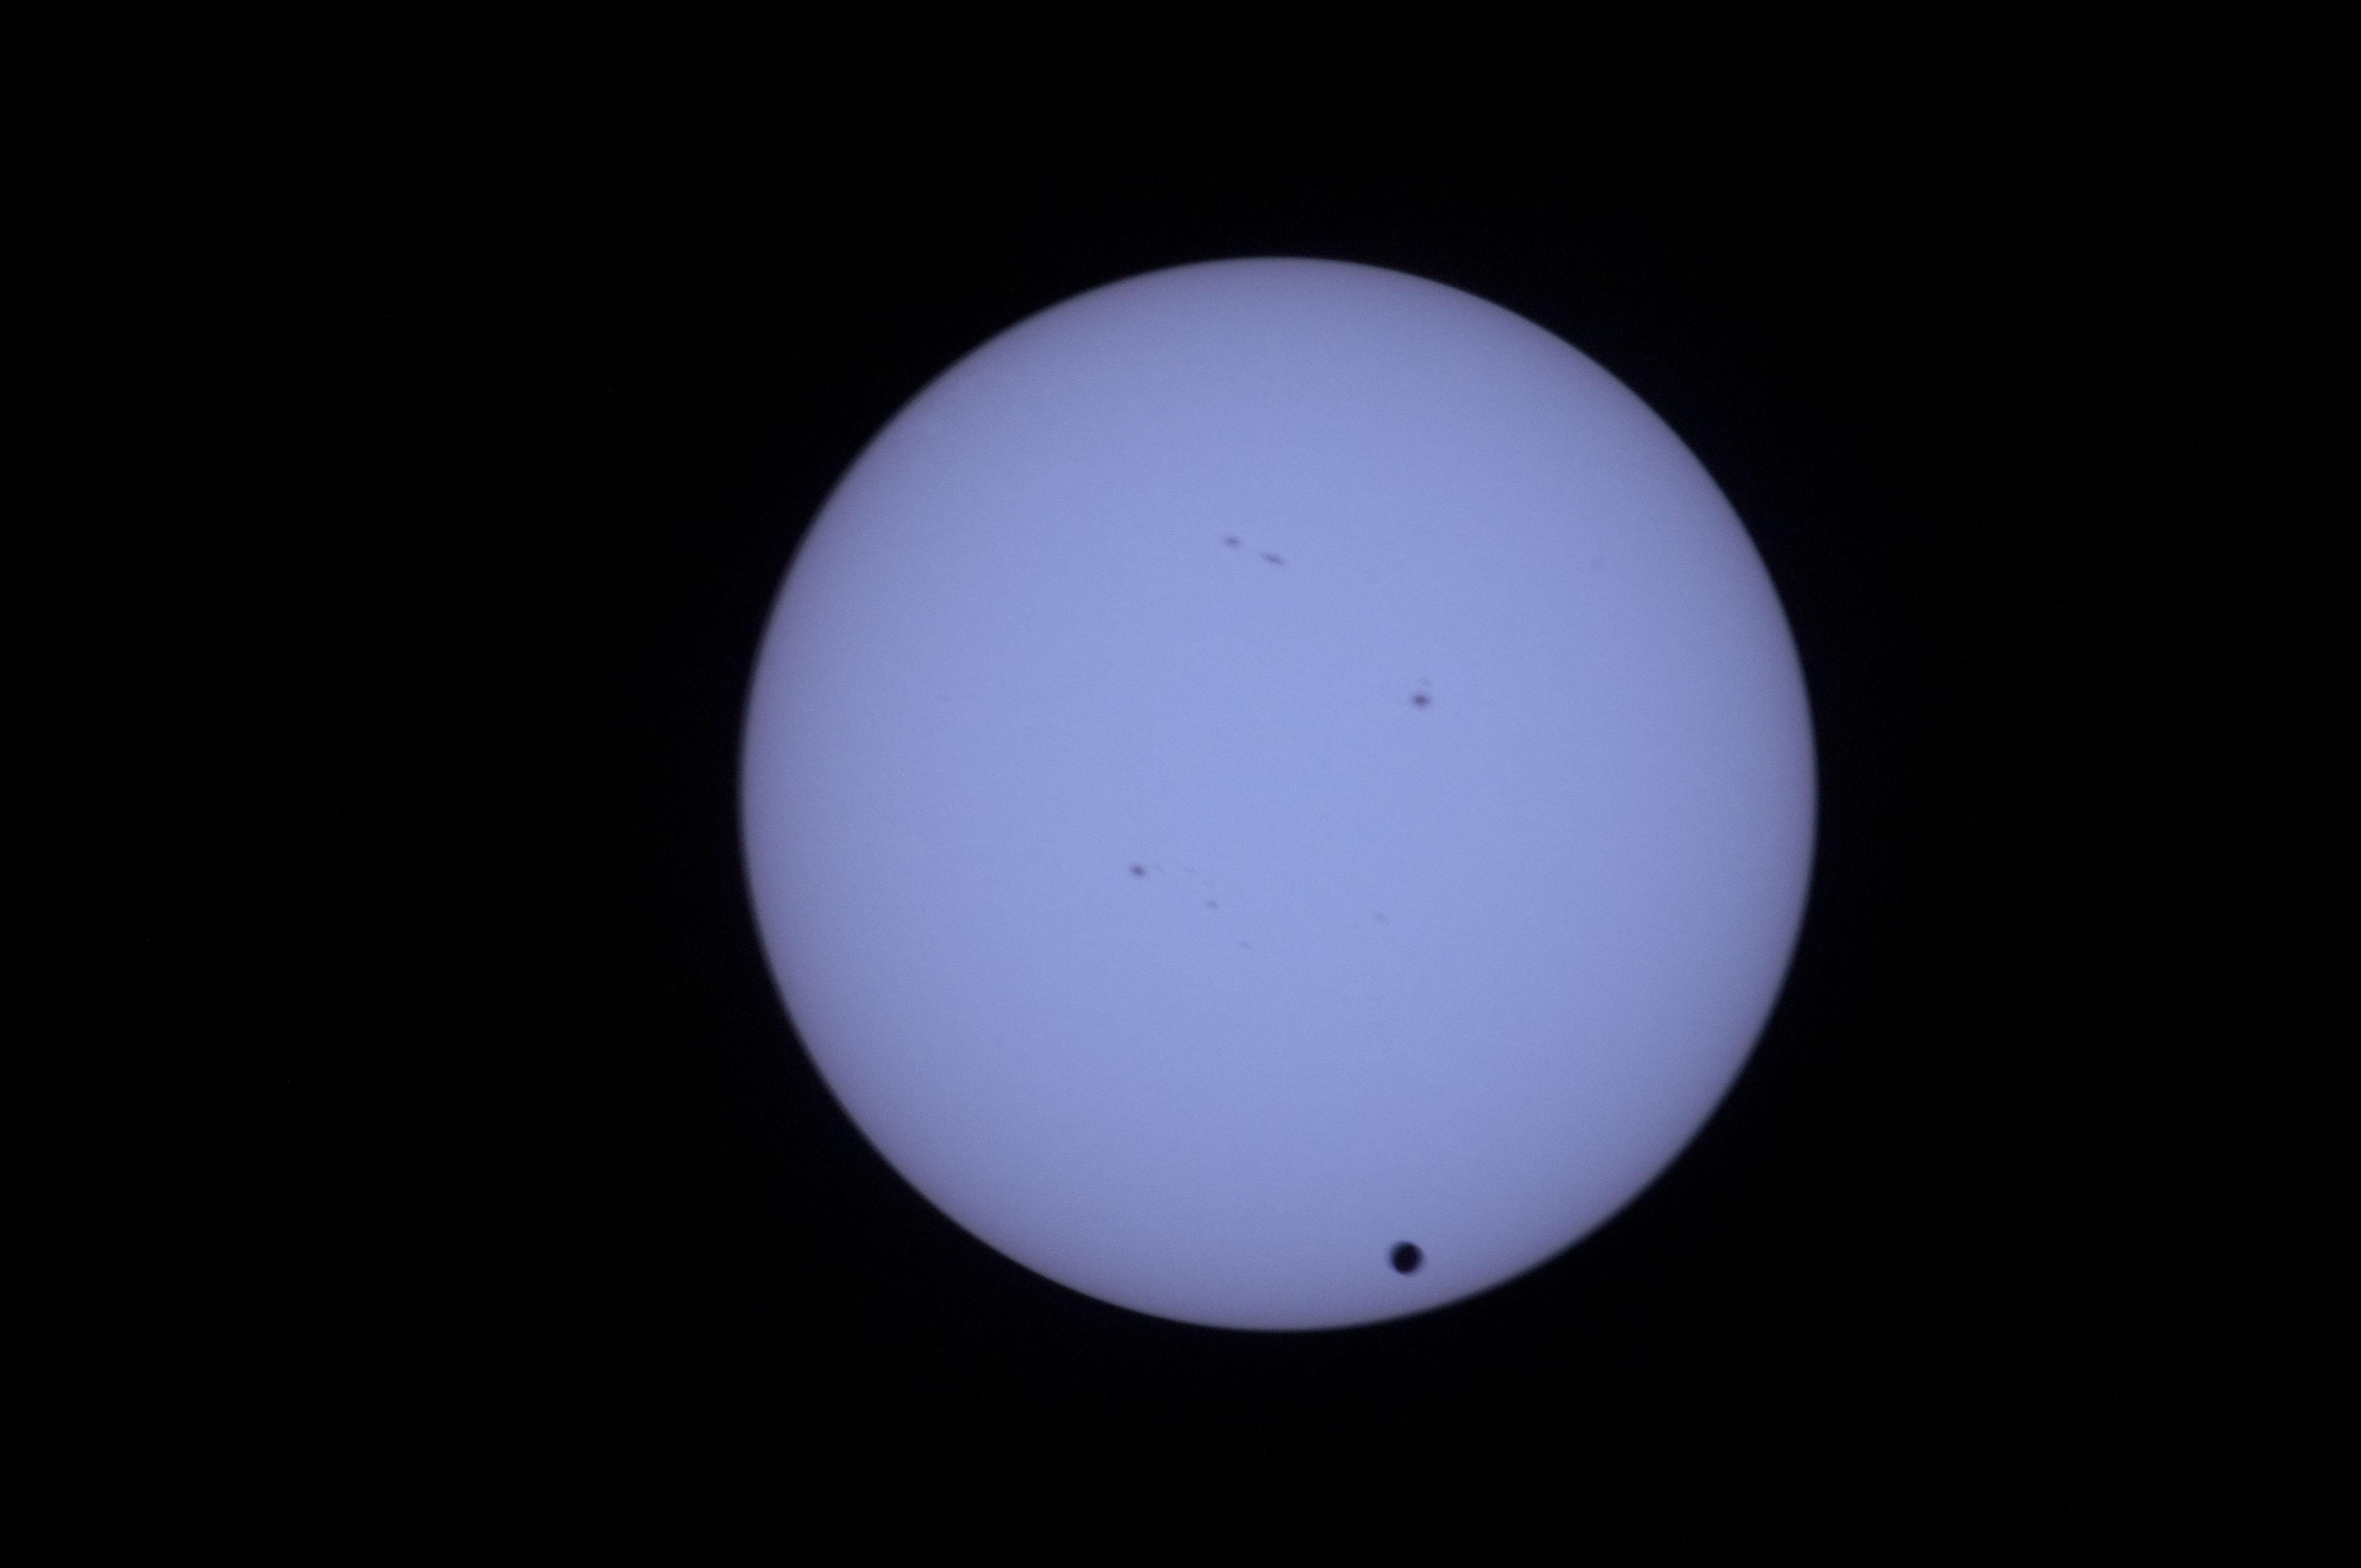 space station venus sun - photo #5